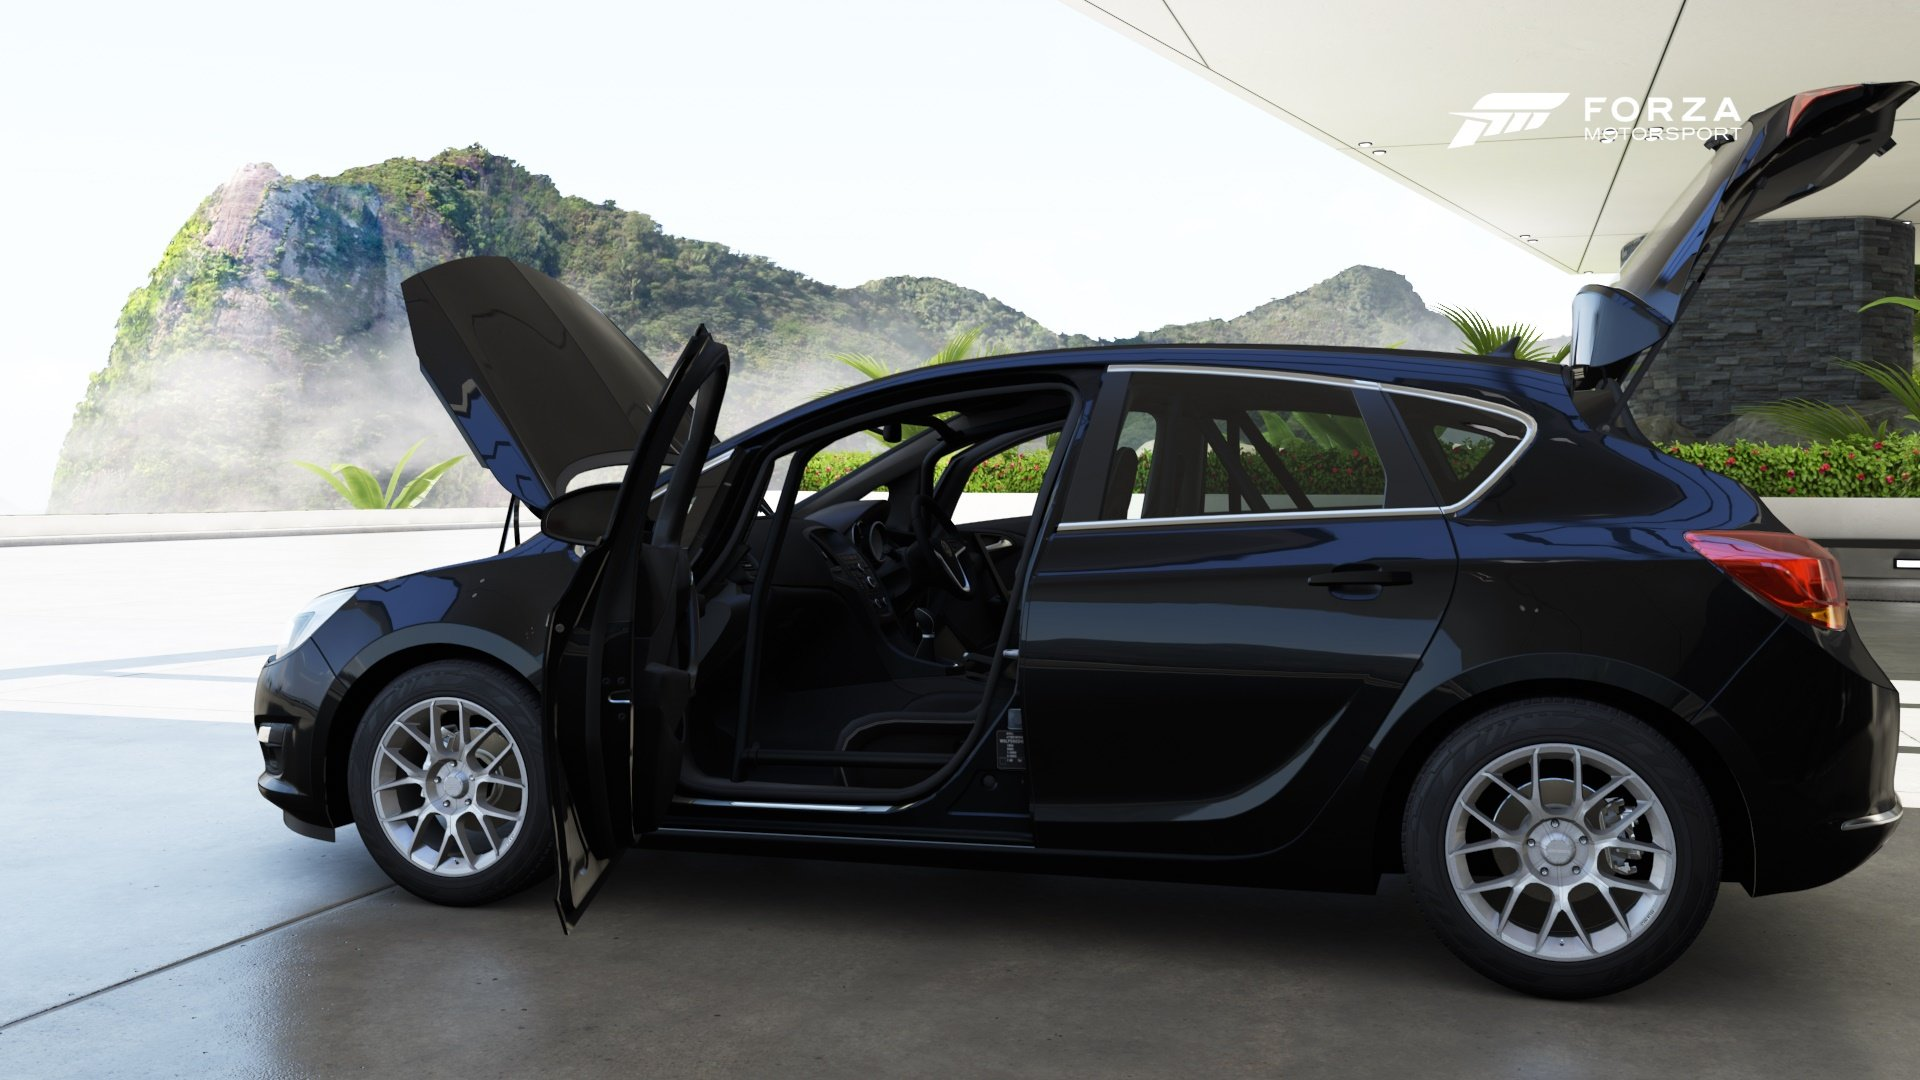 Глубина проработки авто в Forza 6 - Изображение 1